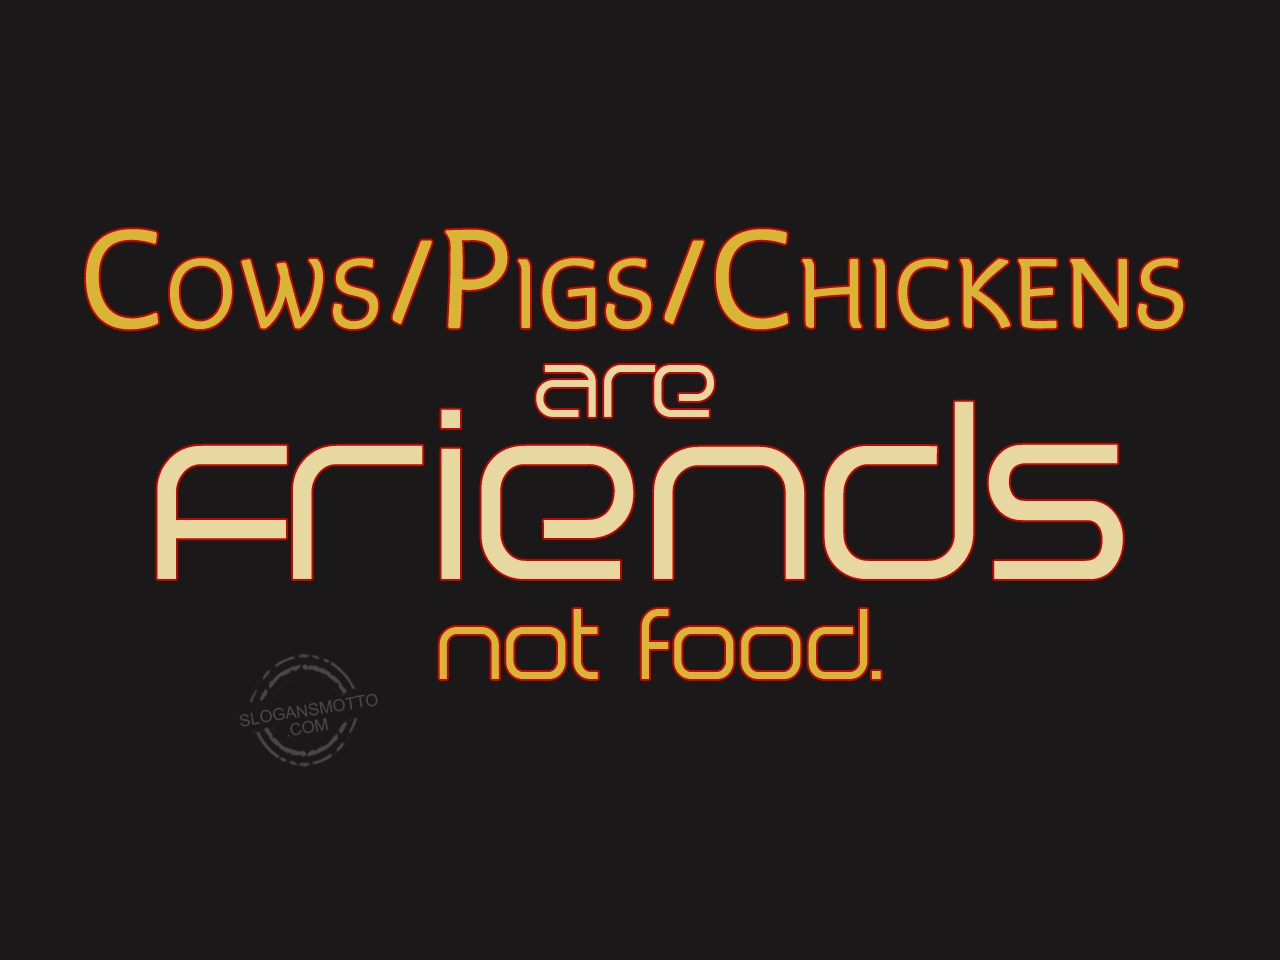 Slogans About Cruelty Against Animals